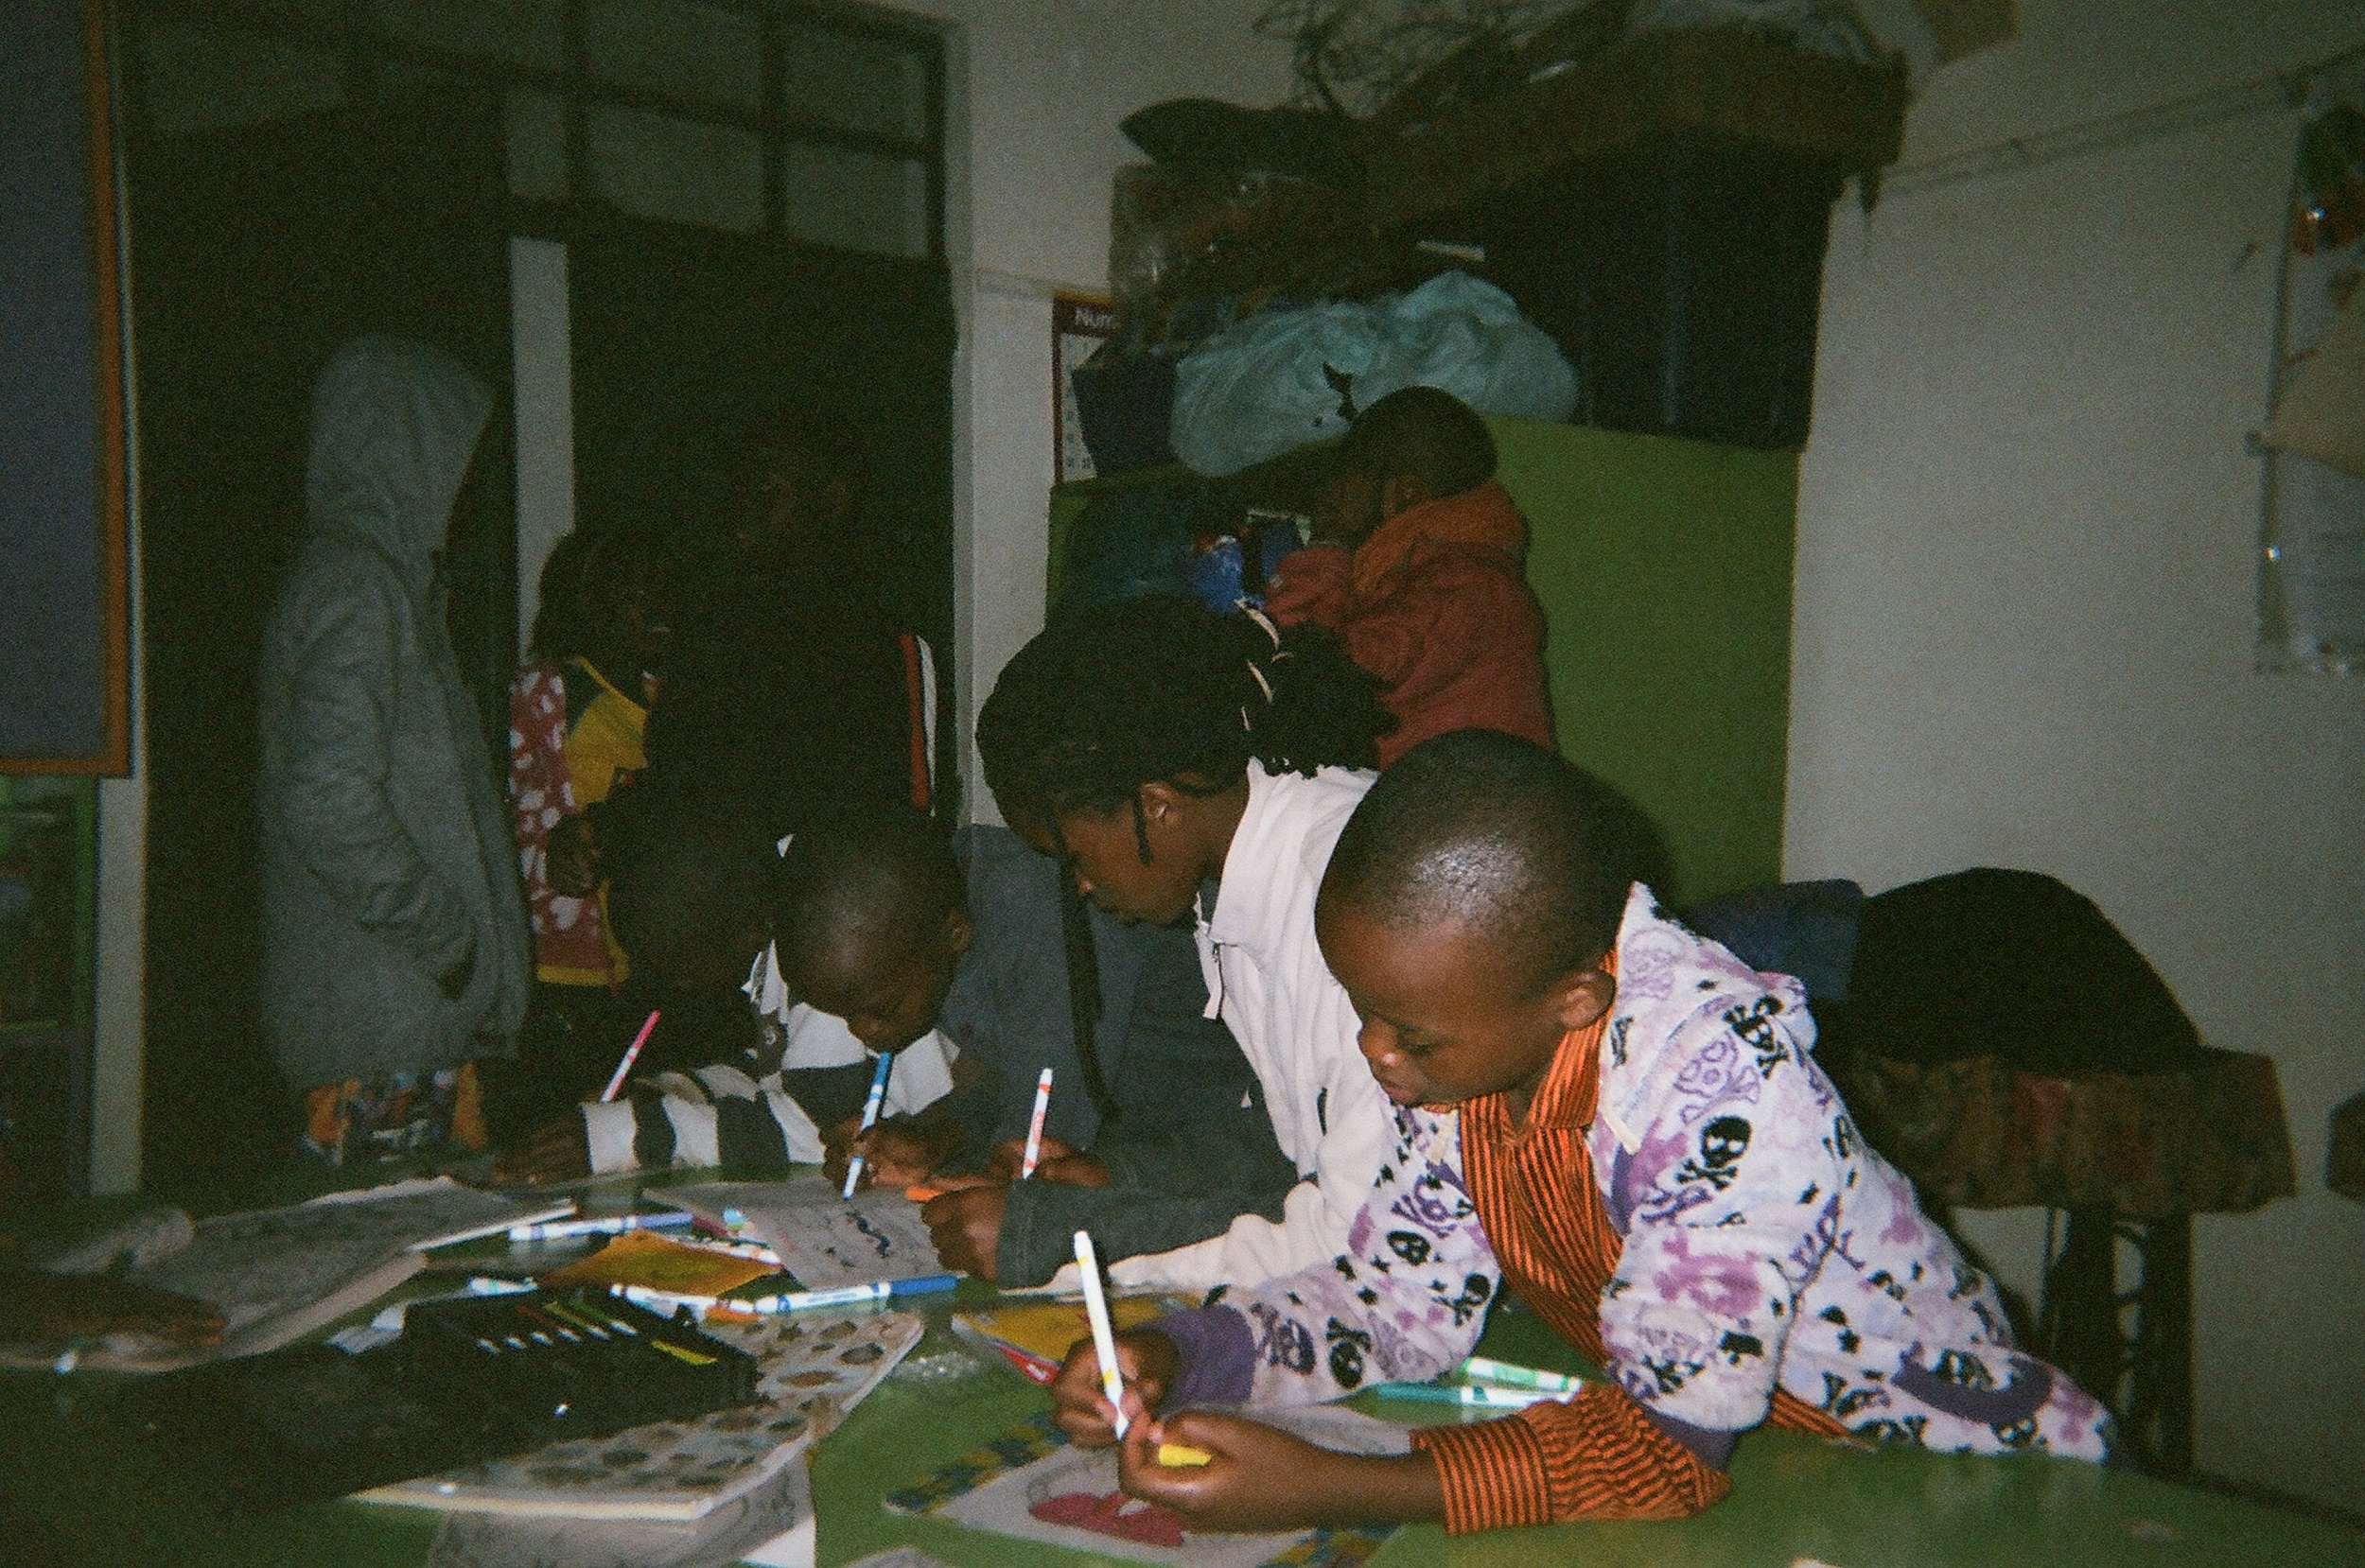 Edwin Mombasa - 9 years old